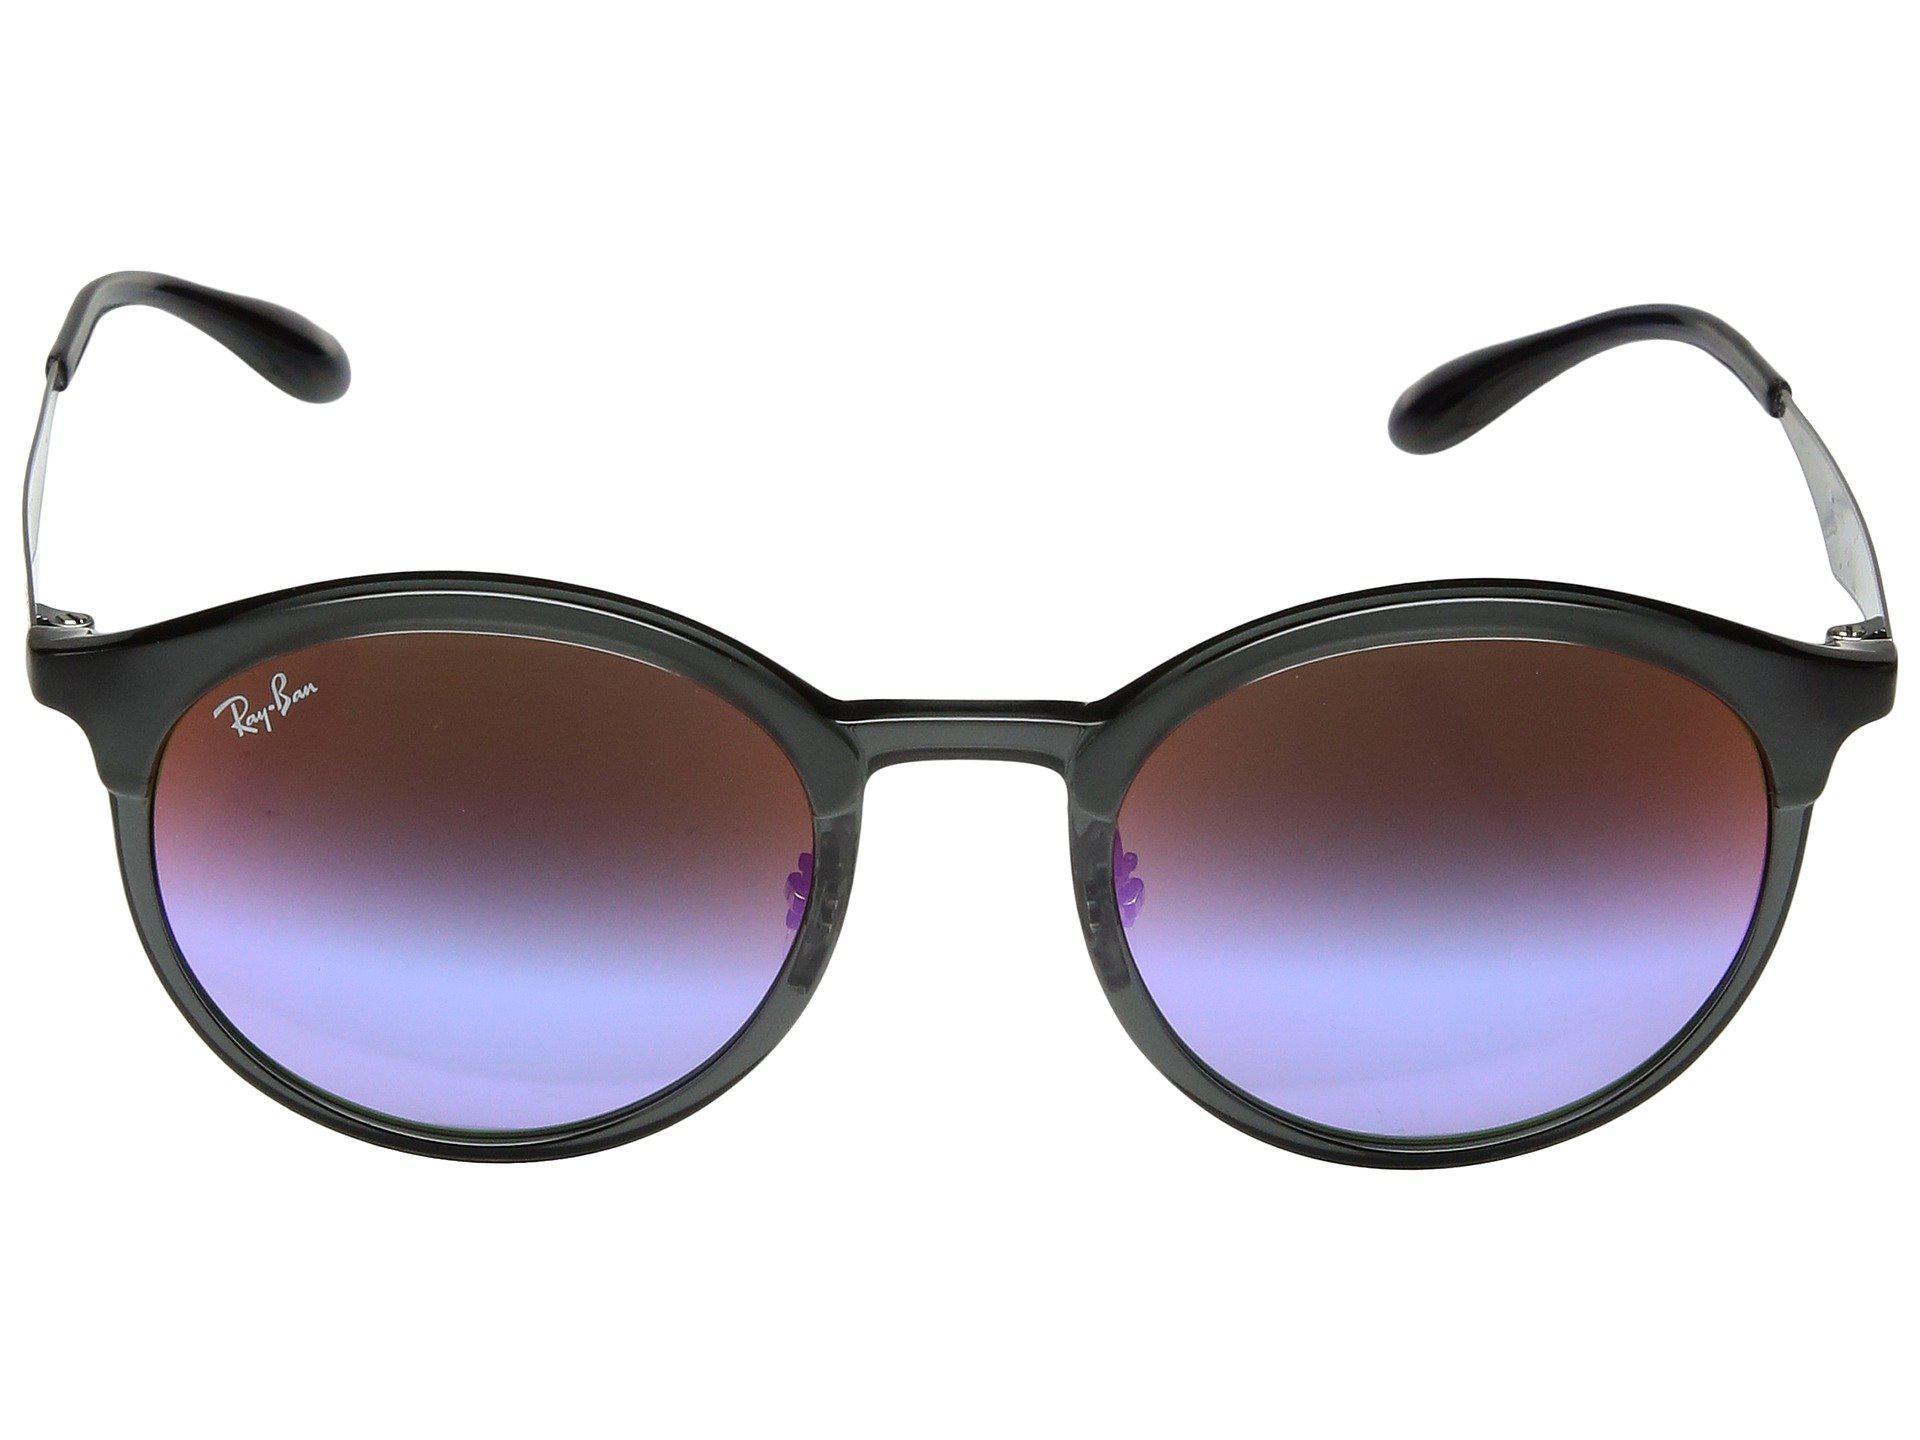 e866a97220 Lyst - Ray-Ban Rb4277 Emma 51mm (havana dark Brown) Fashion ...